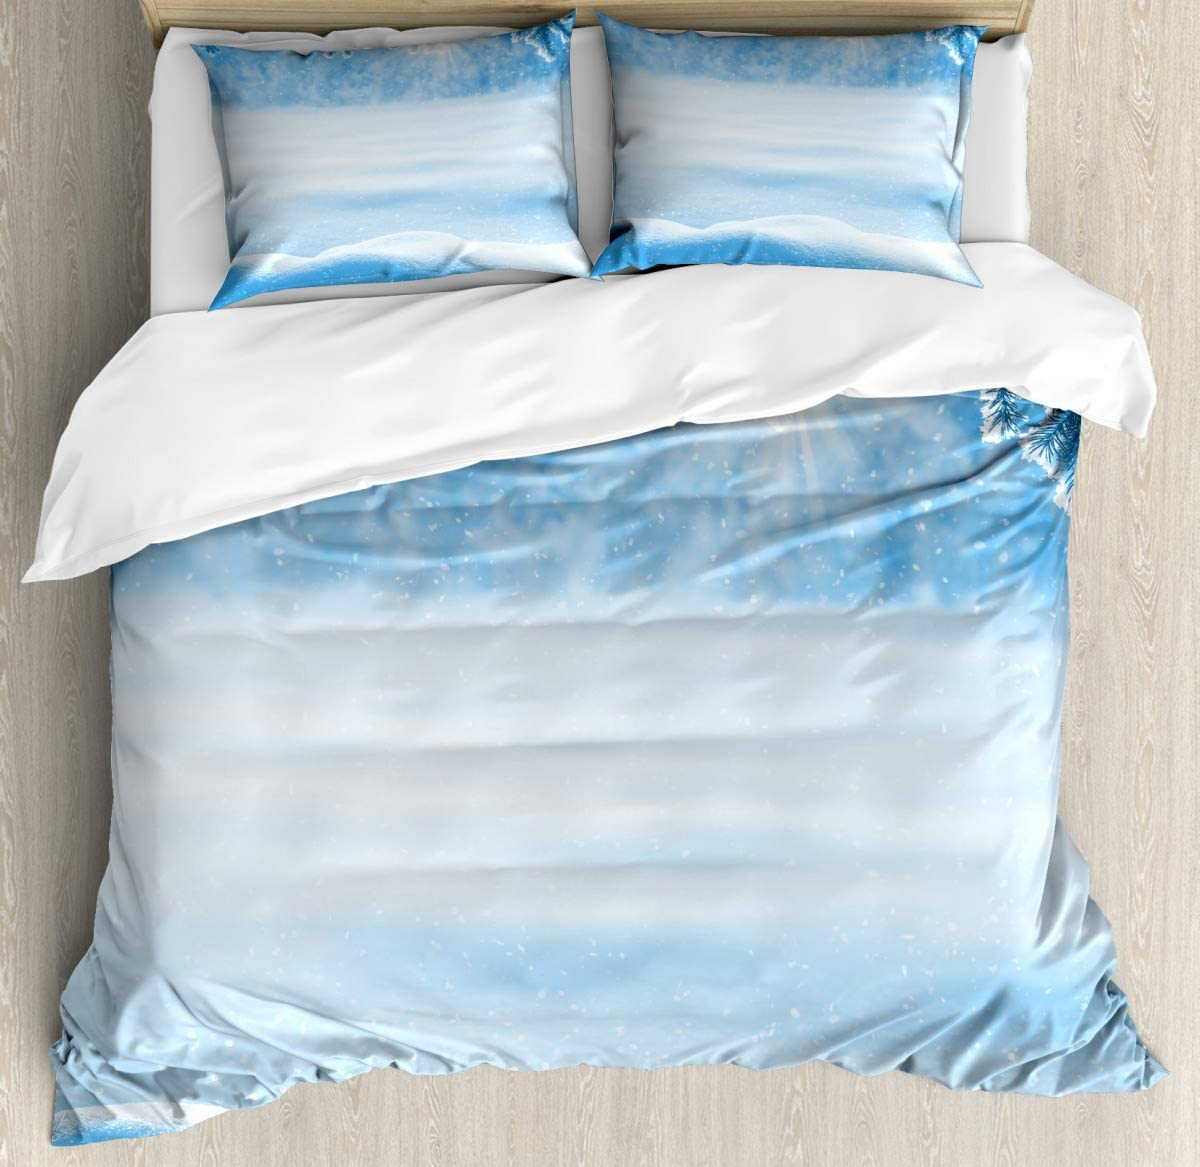 "Duvet Cover Bedding Duvet Cover SetSnow Cold Winter Duvet Cover SetCustom 3 Piece Bedding Set with 2 Pillow Shams,86""x94""/19""x29""inch"